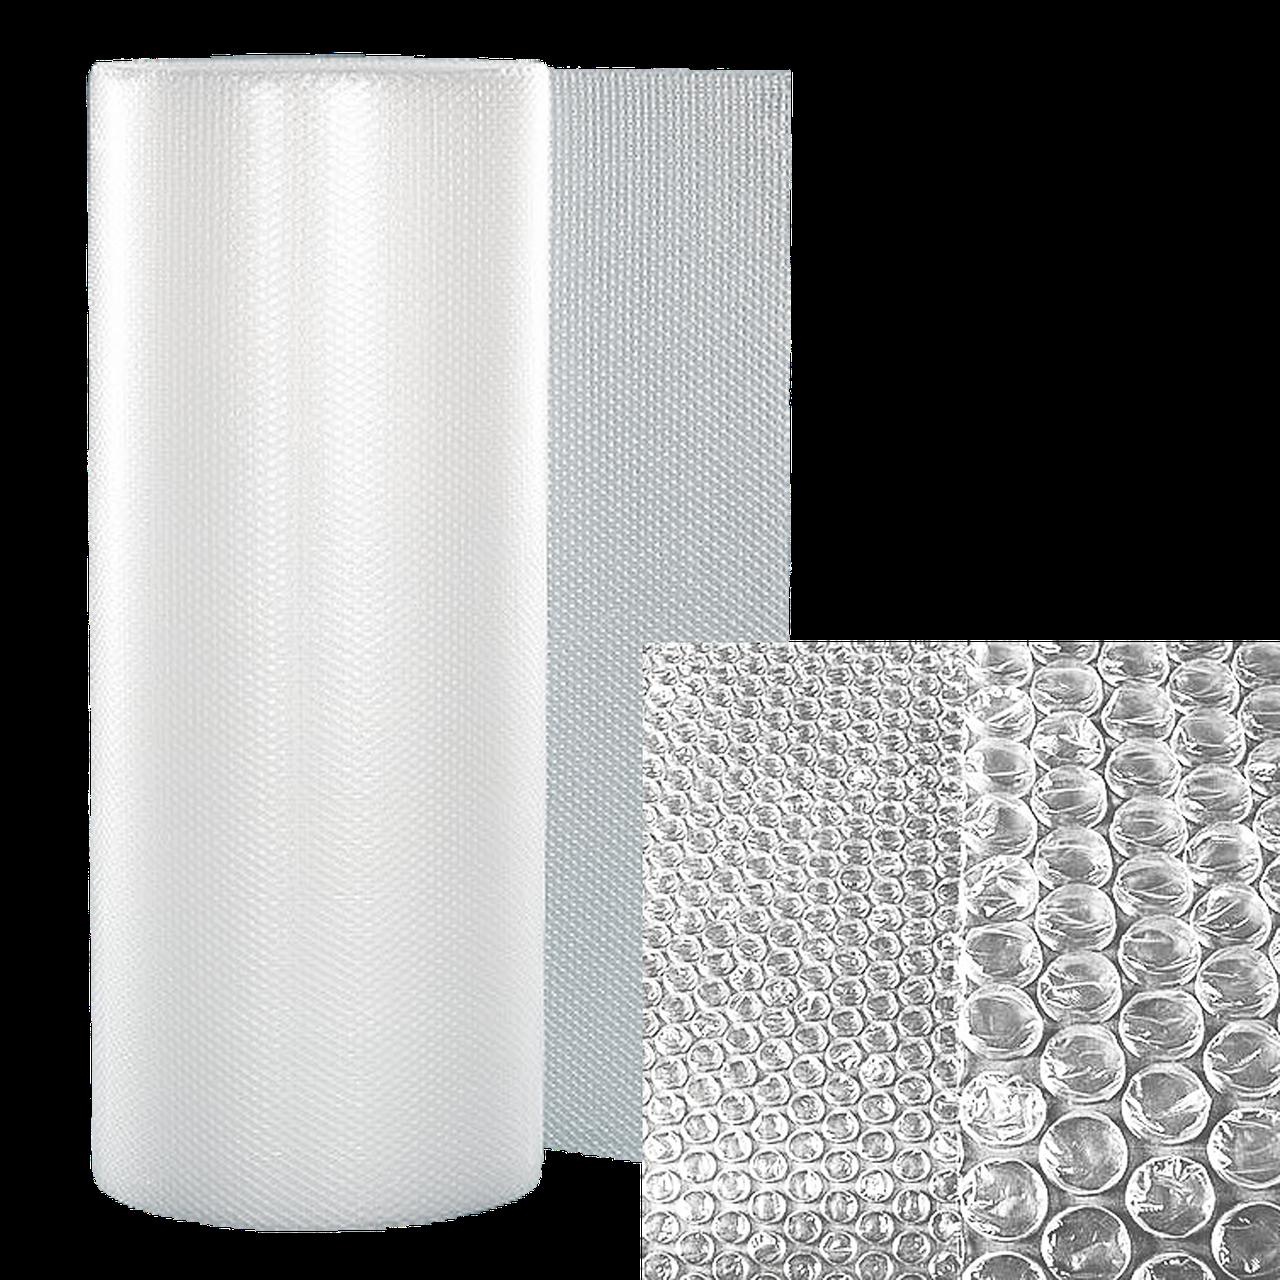 Воздушно-пузырчатая пленка Д45, ширина 1.1 м (рулон 50м), диаметр пузырька 10 мм.